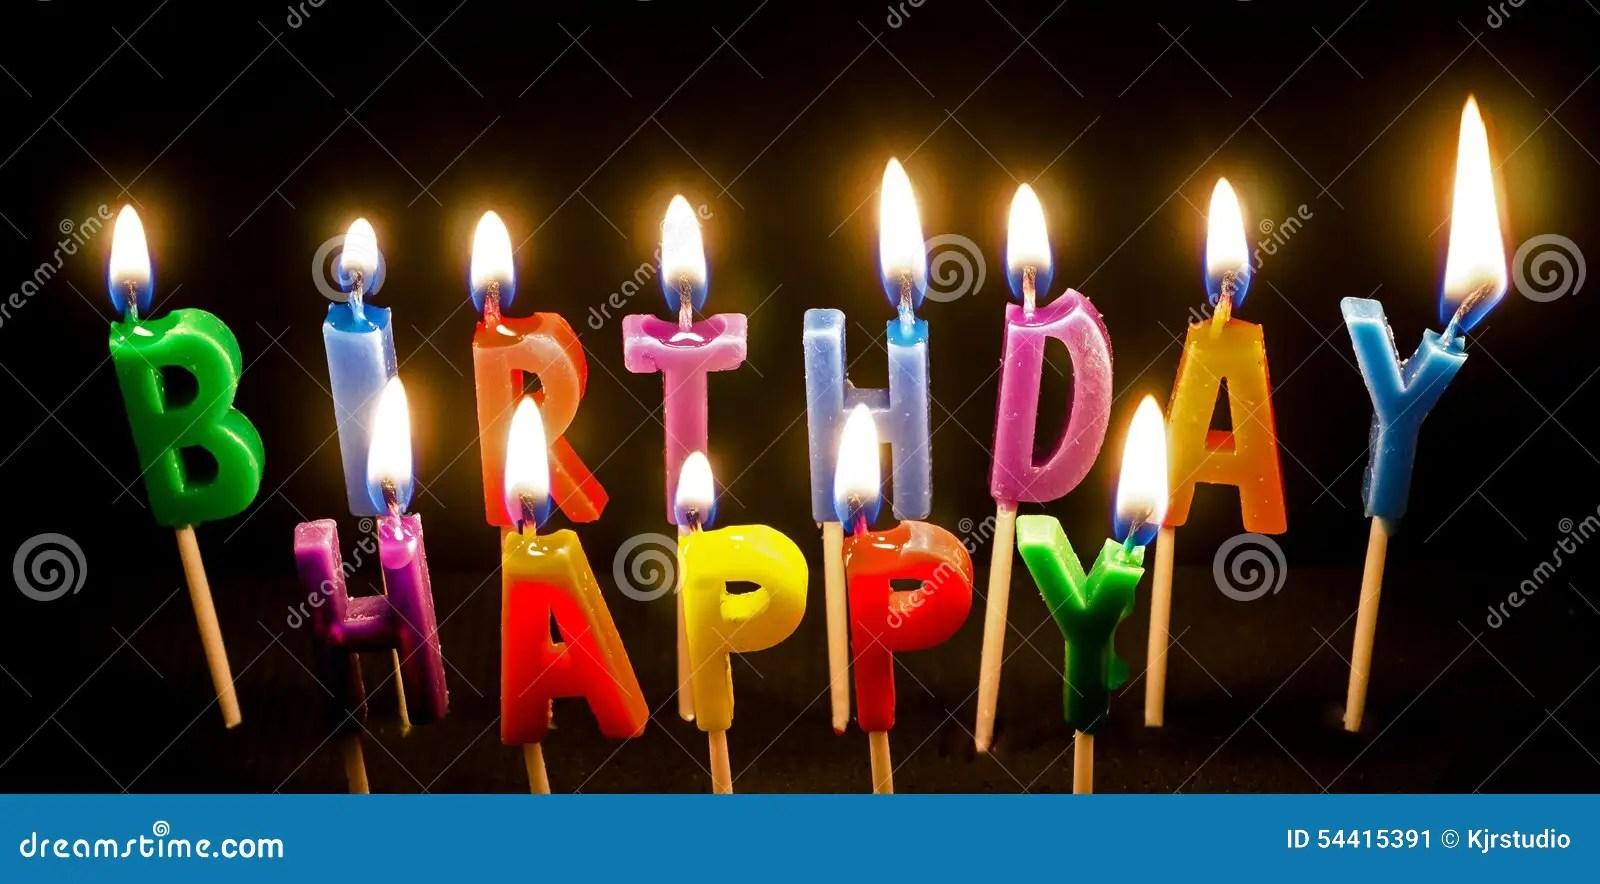 Birthday Cake Candles Lit Stock Image Image Of Wicks